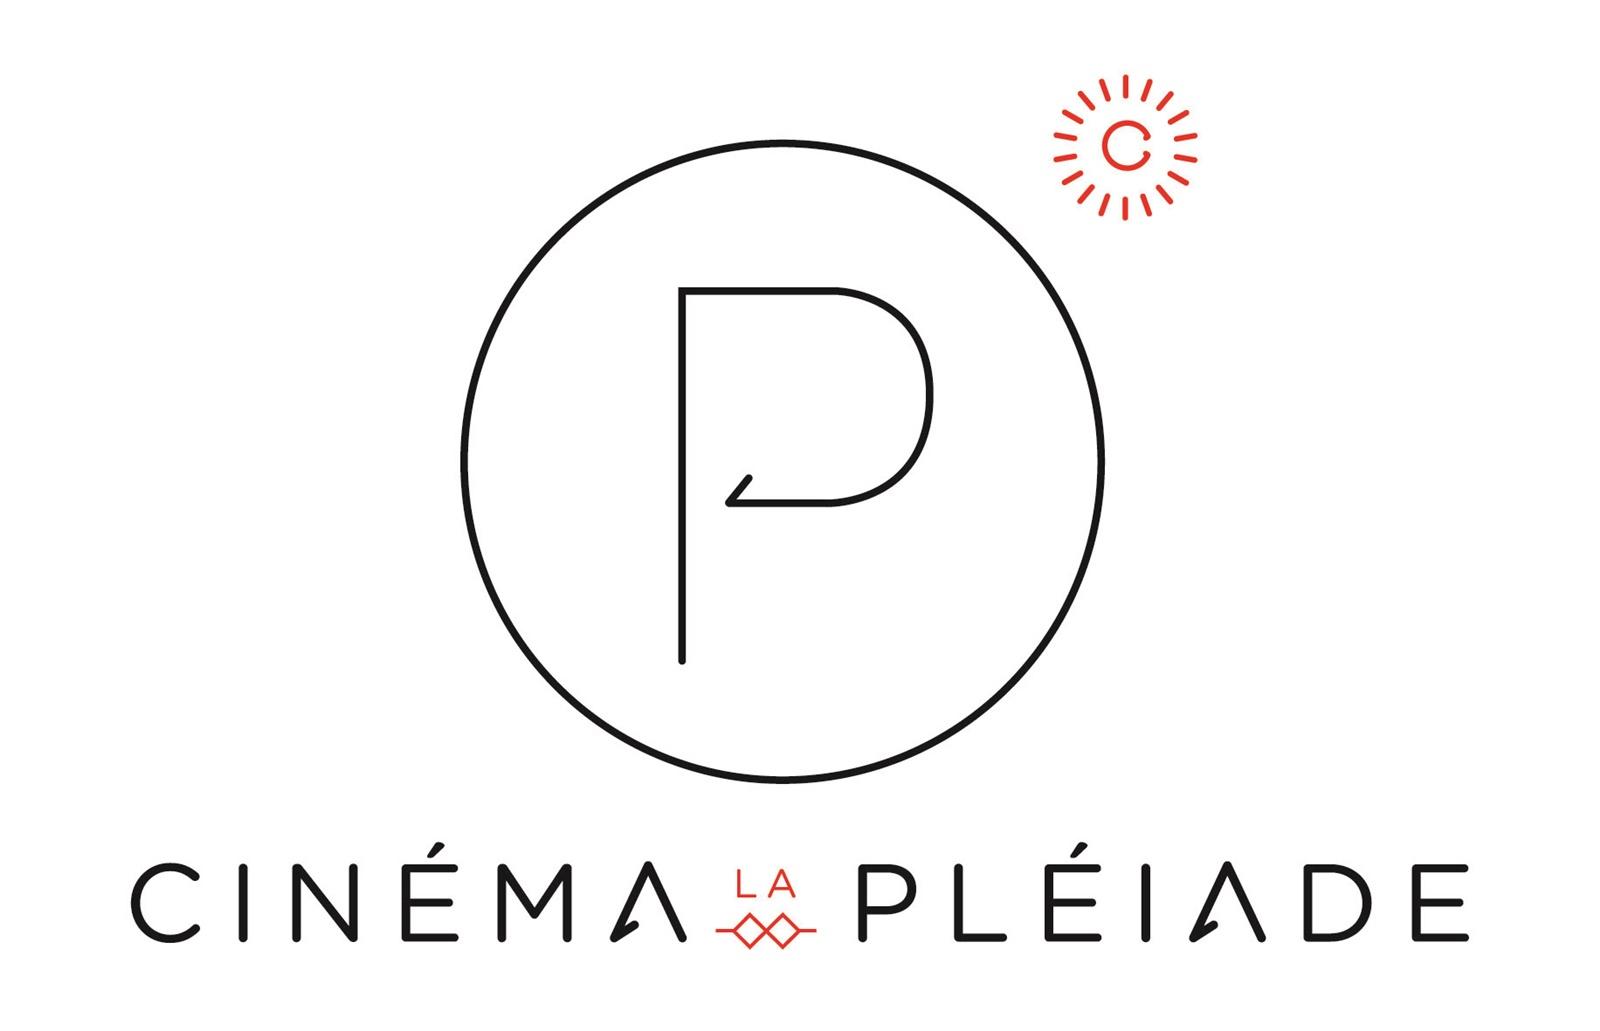 cinema-pleiade